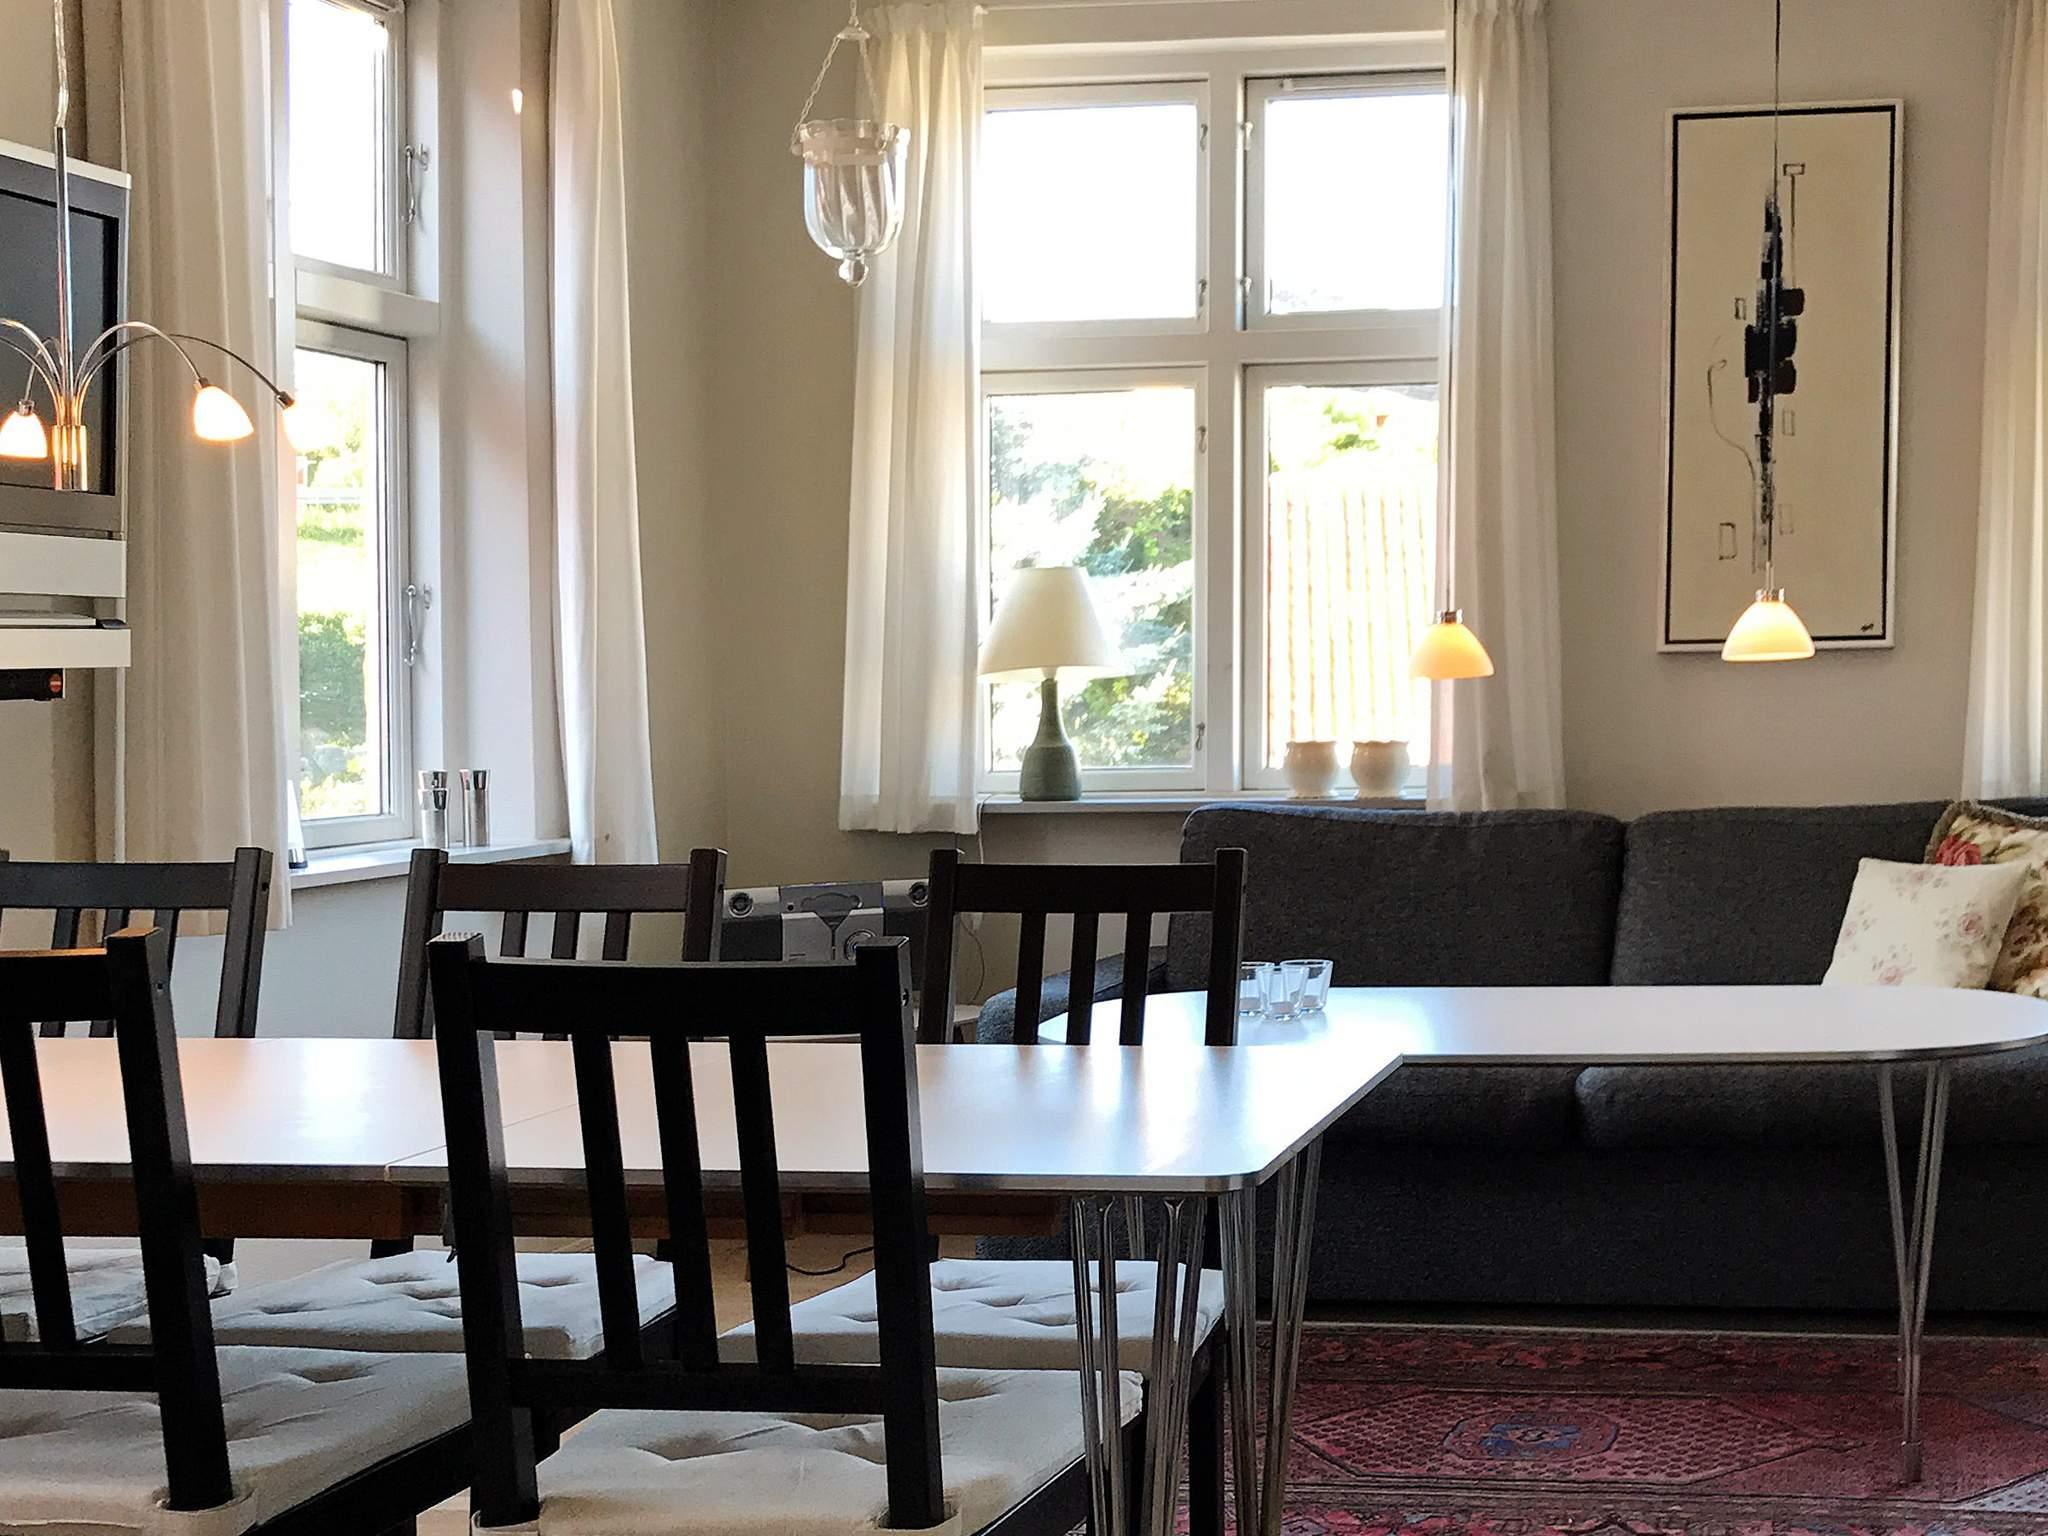 Ferienwohnung Gudhjem (135424), Gudhjem, , Bornholm, Dänemark, Bild 2